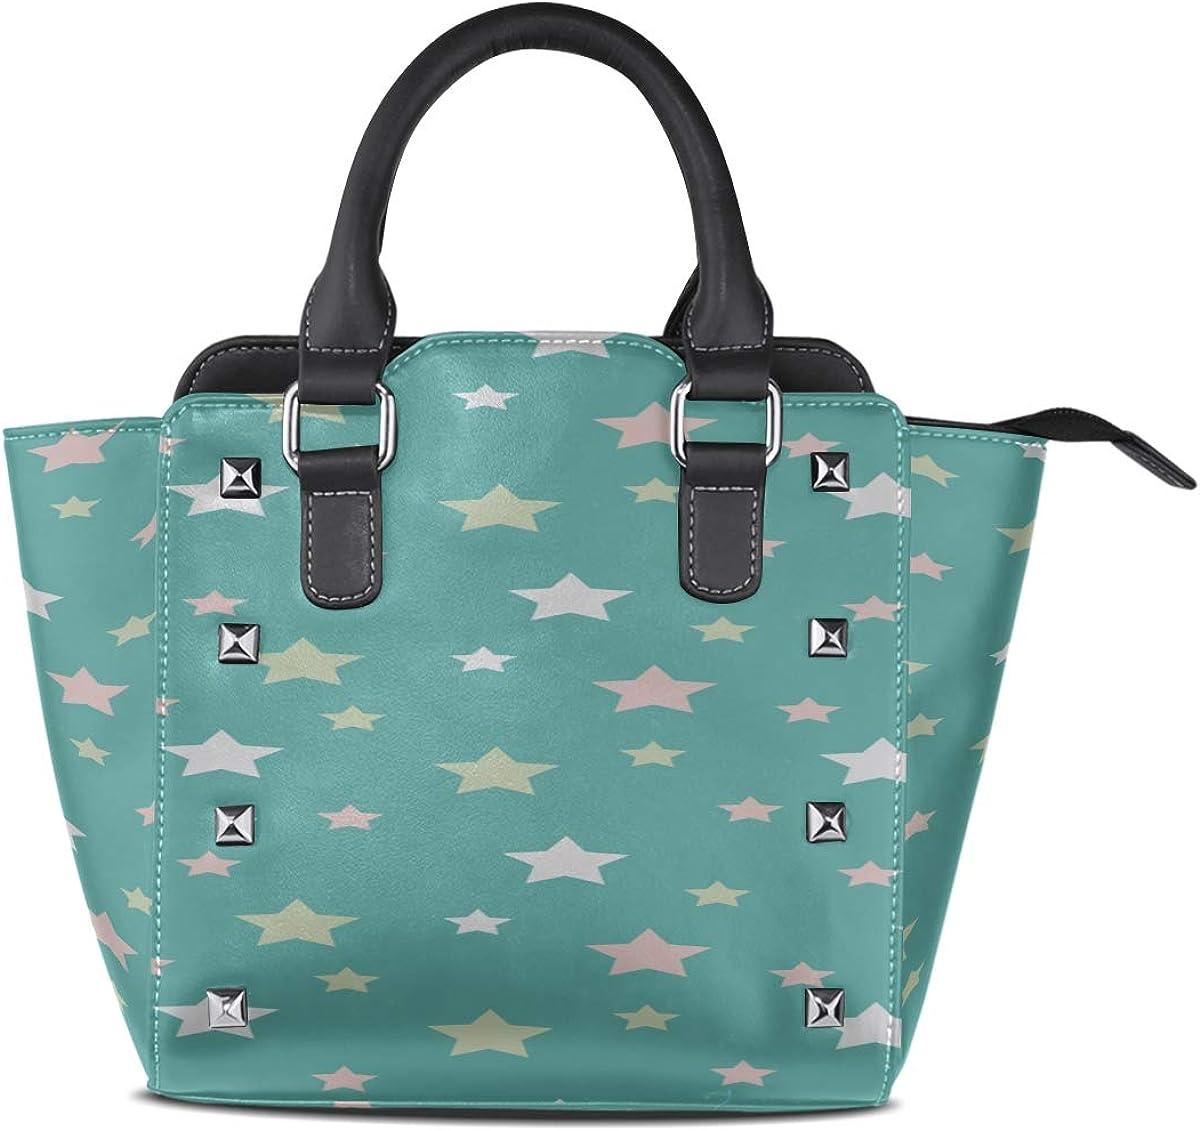 Fashion Bag Endless Christmas Pattern Design Custom Handle Purses Pu Leather Rivet Portable Fashion Printing Waterproof With Zipper Shoulder Bags Kids